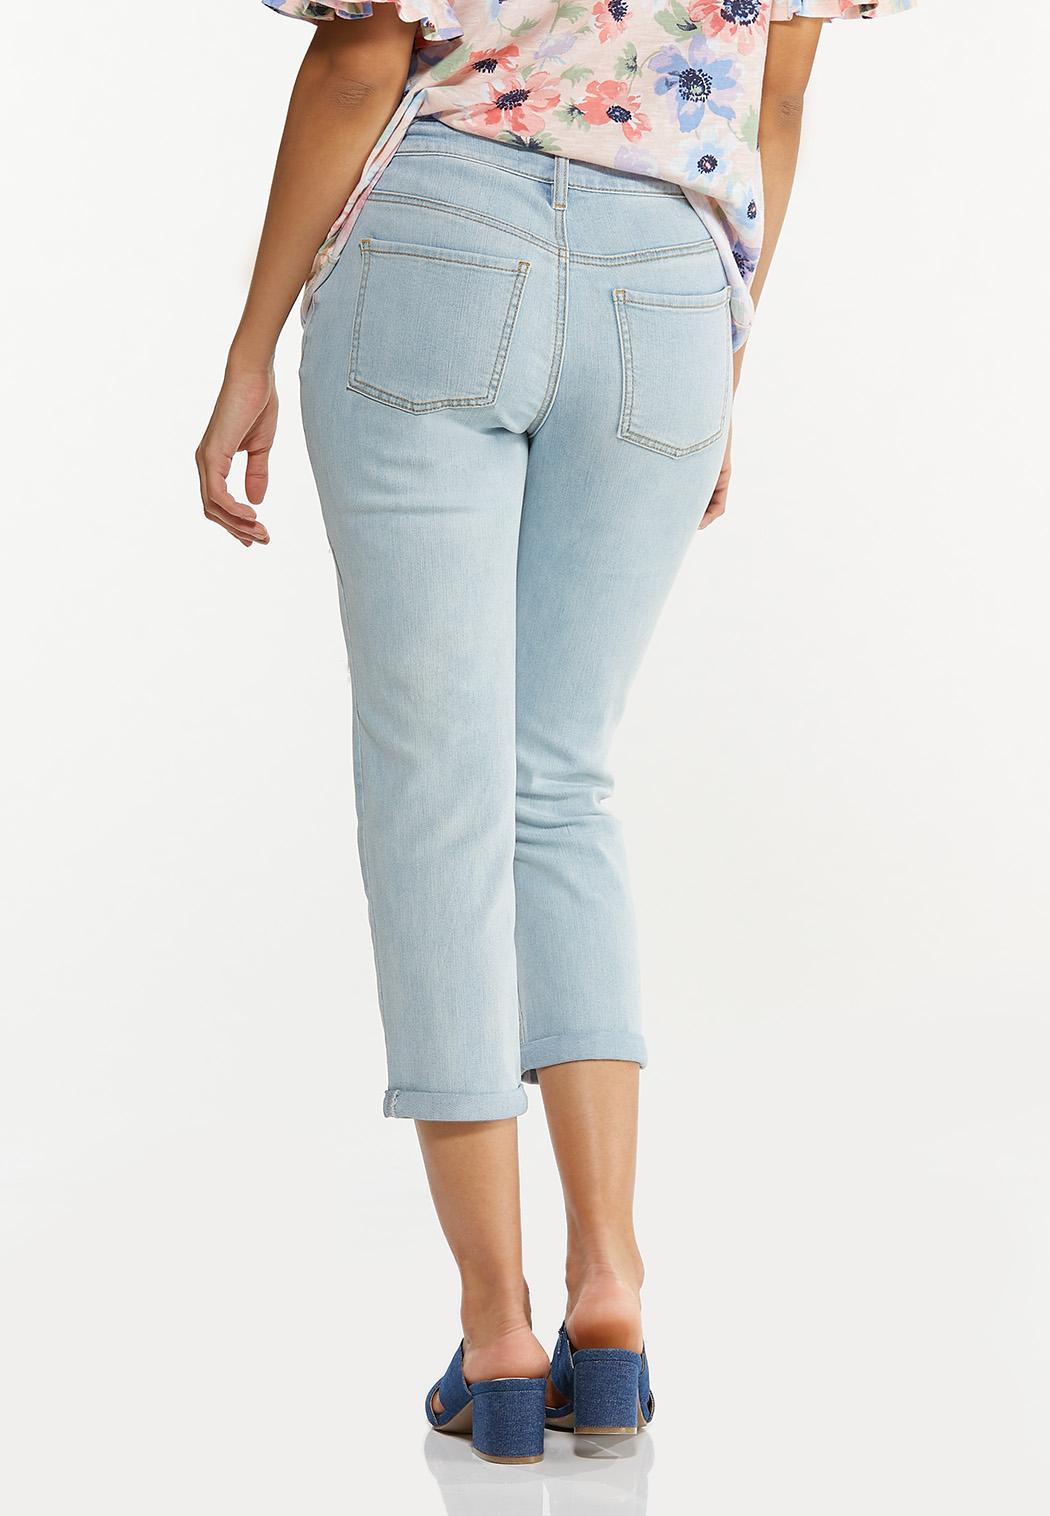 Cropped Distressed Boyfriend Jeans (Item #44575721)